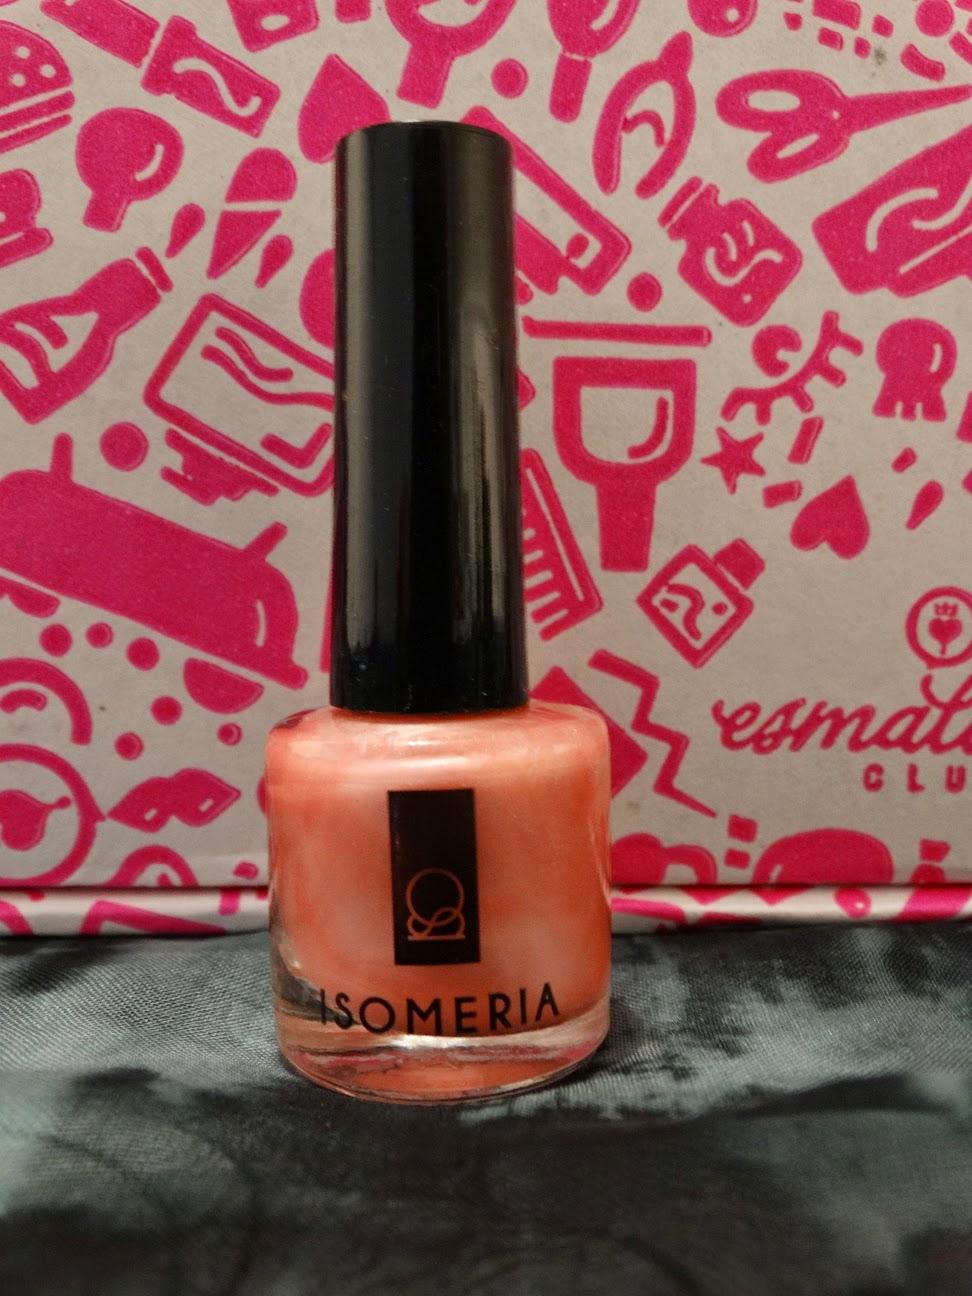 Isomeria - Rosa cintila